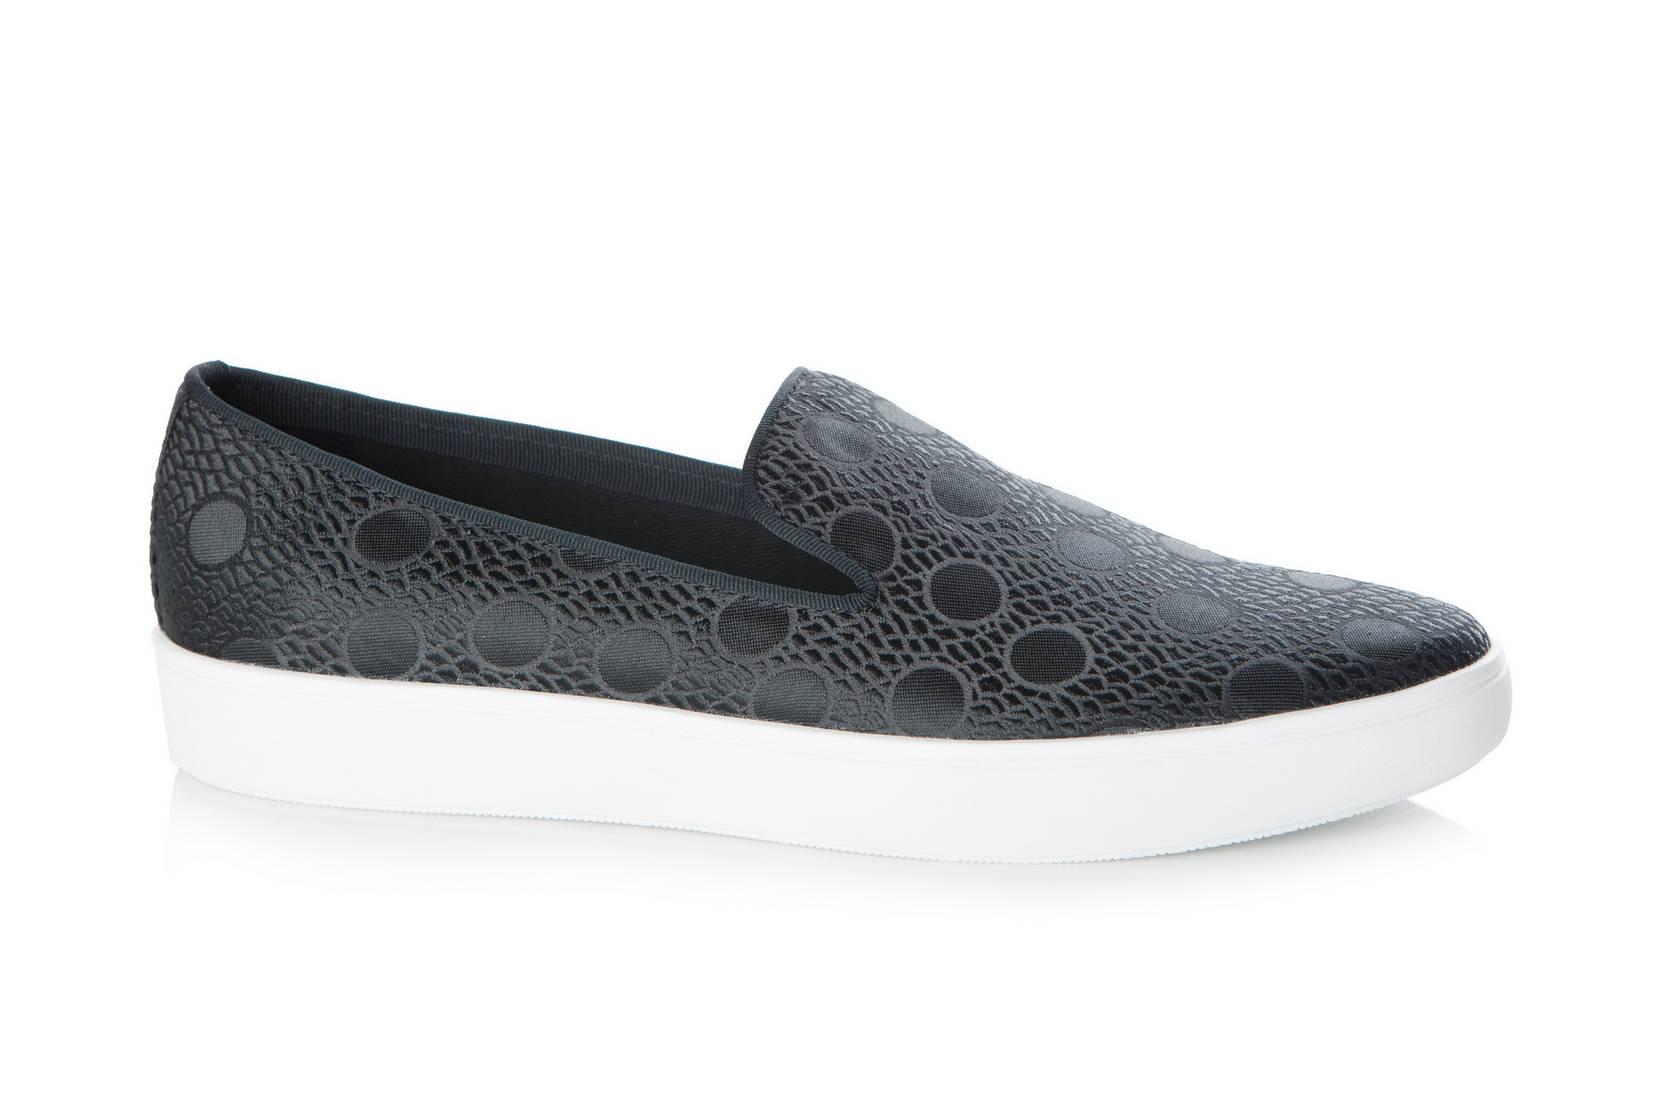 Alisa-kengät, slip-in-malli